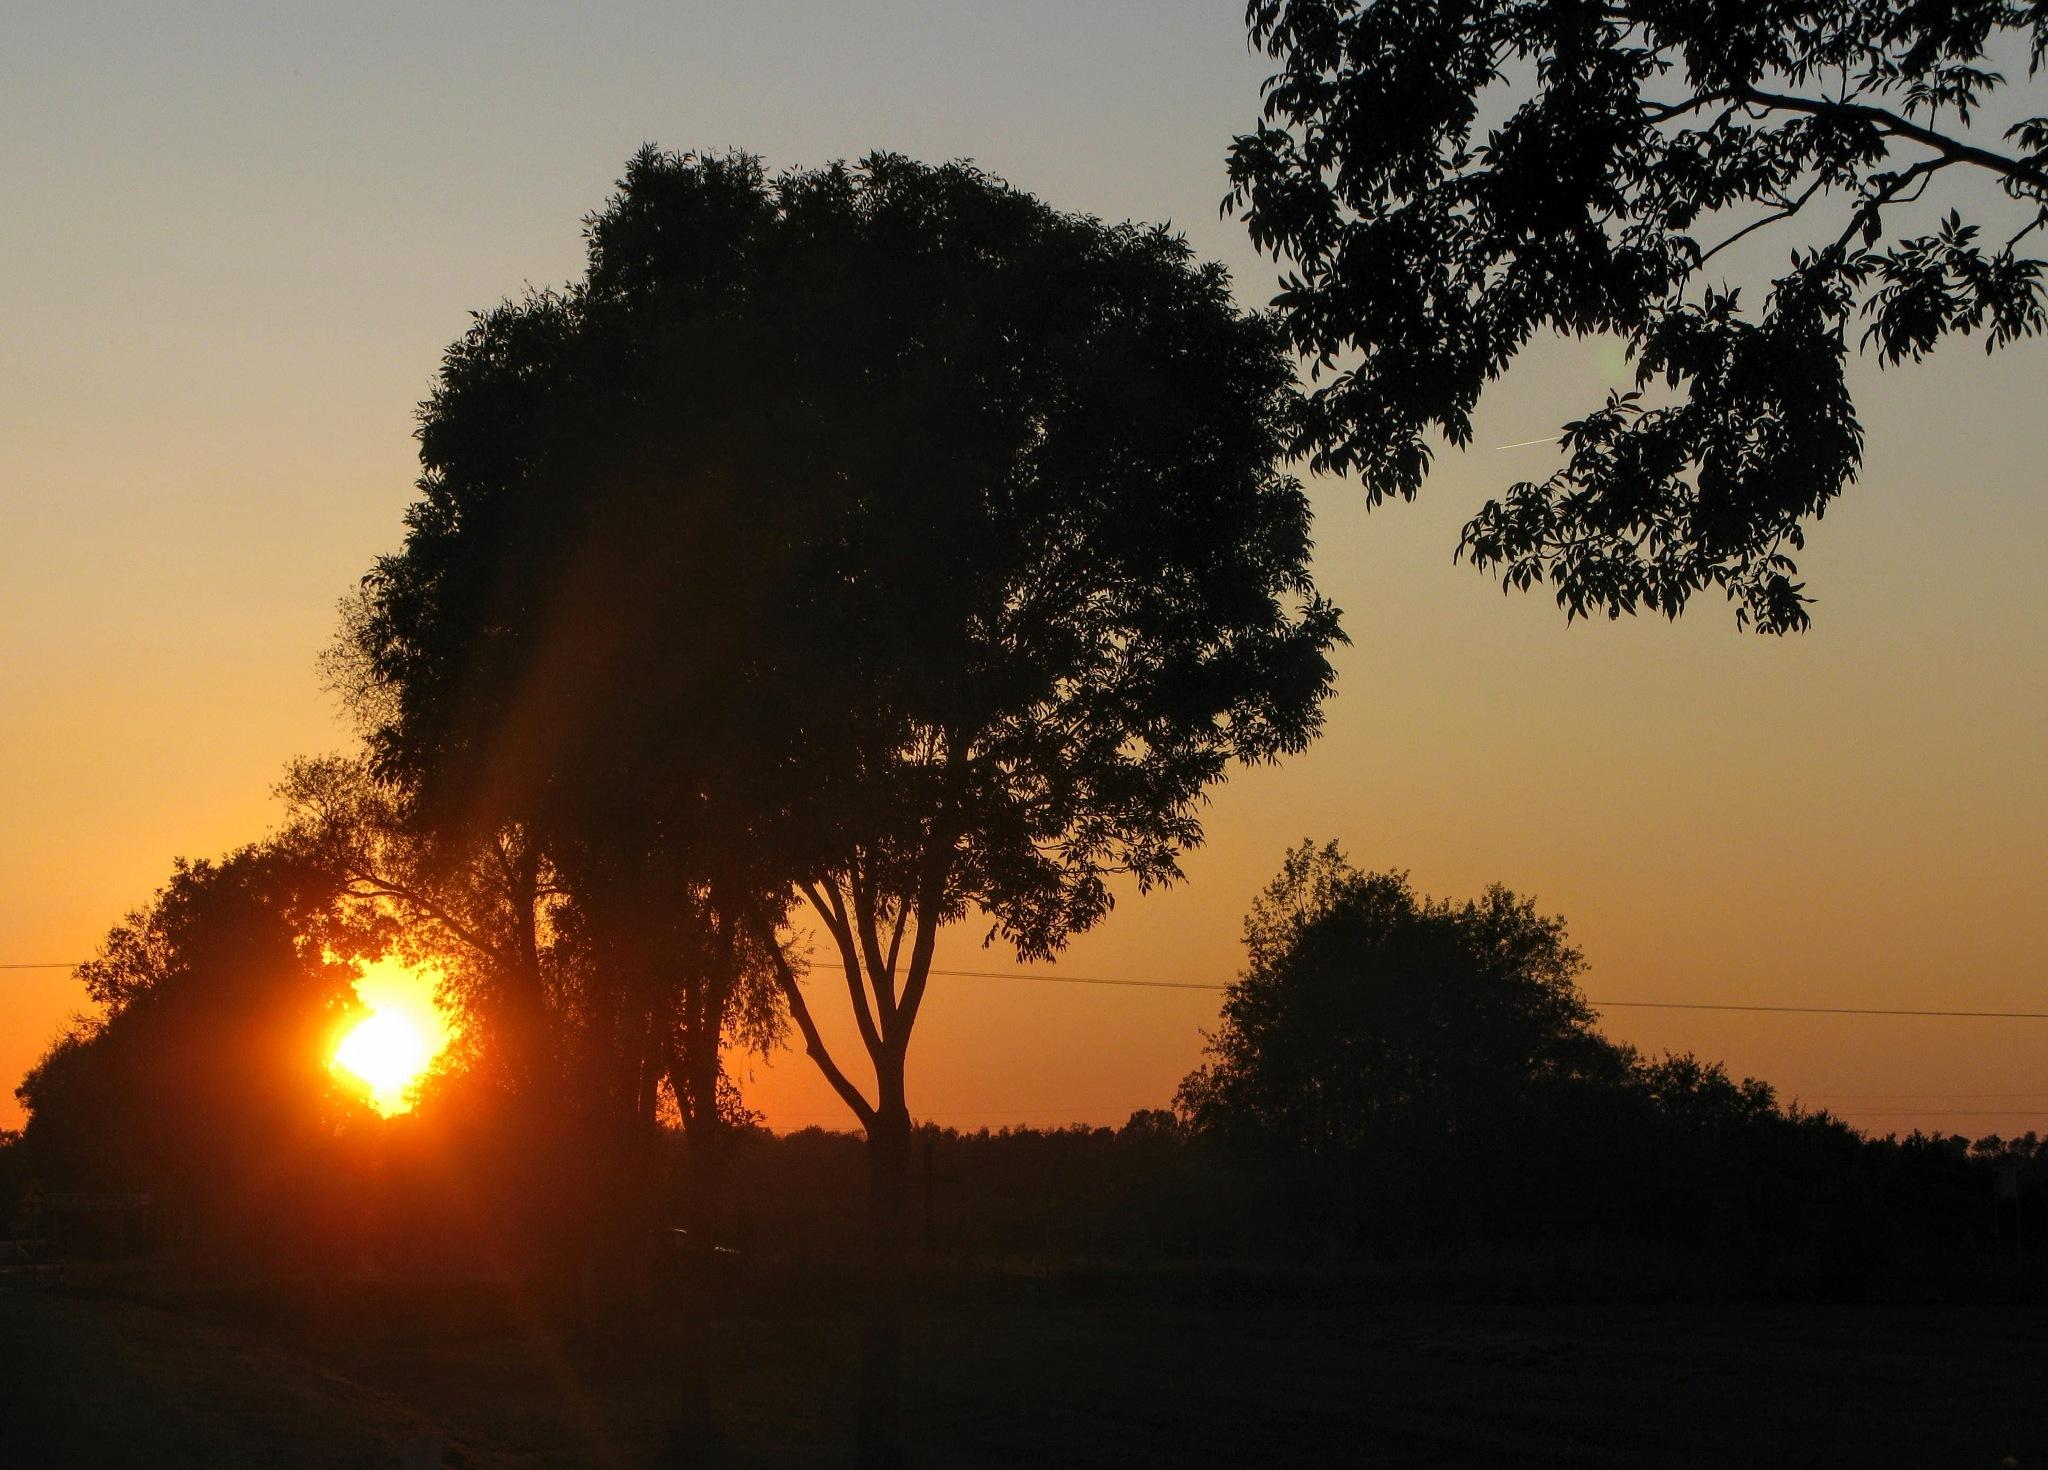 Sunset among trees by Ela Gajowska